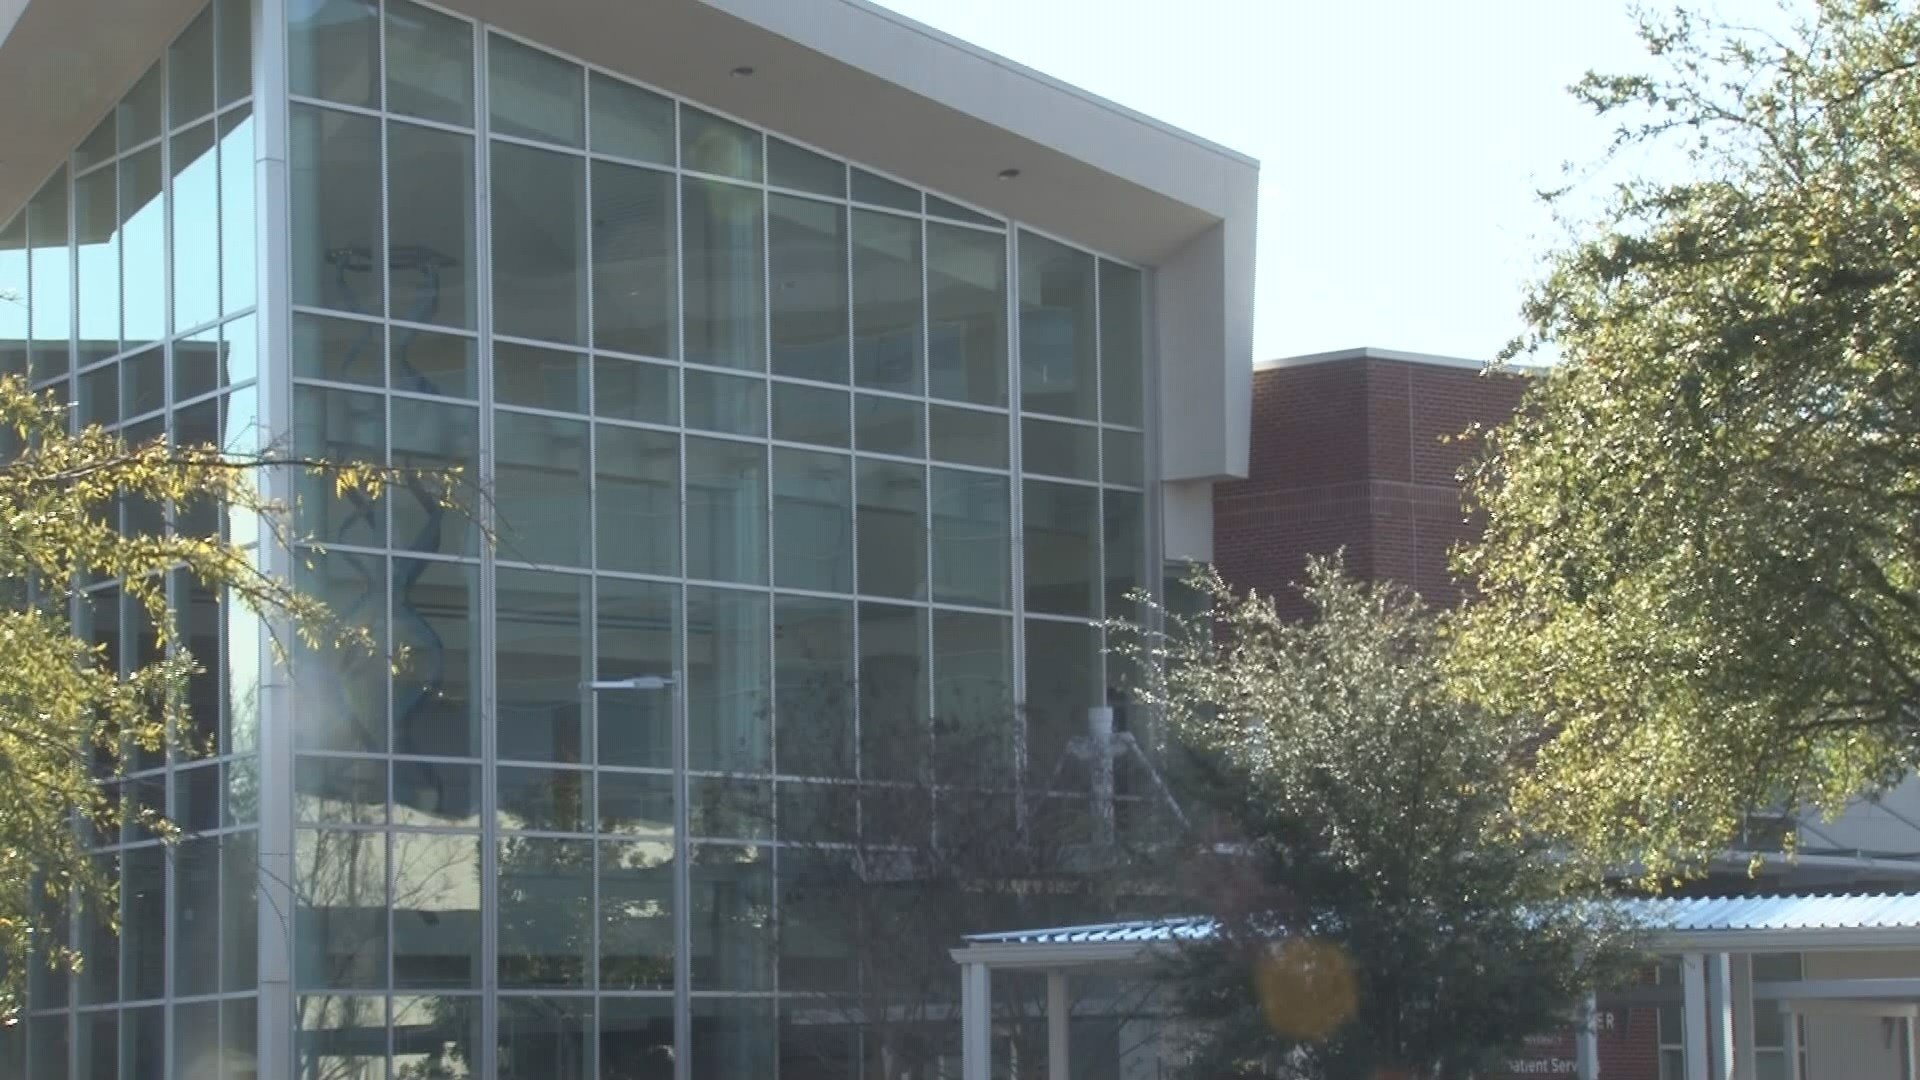 Investigation into phishing attack at Augusta University (Wfxg)